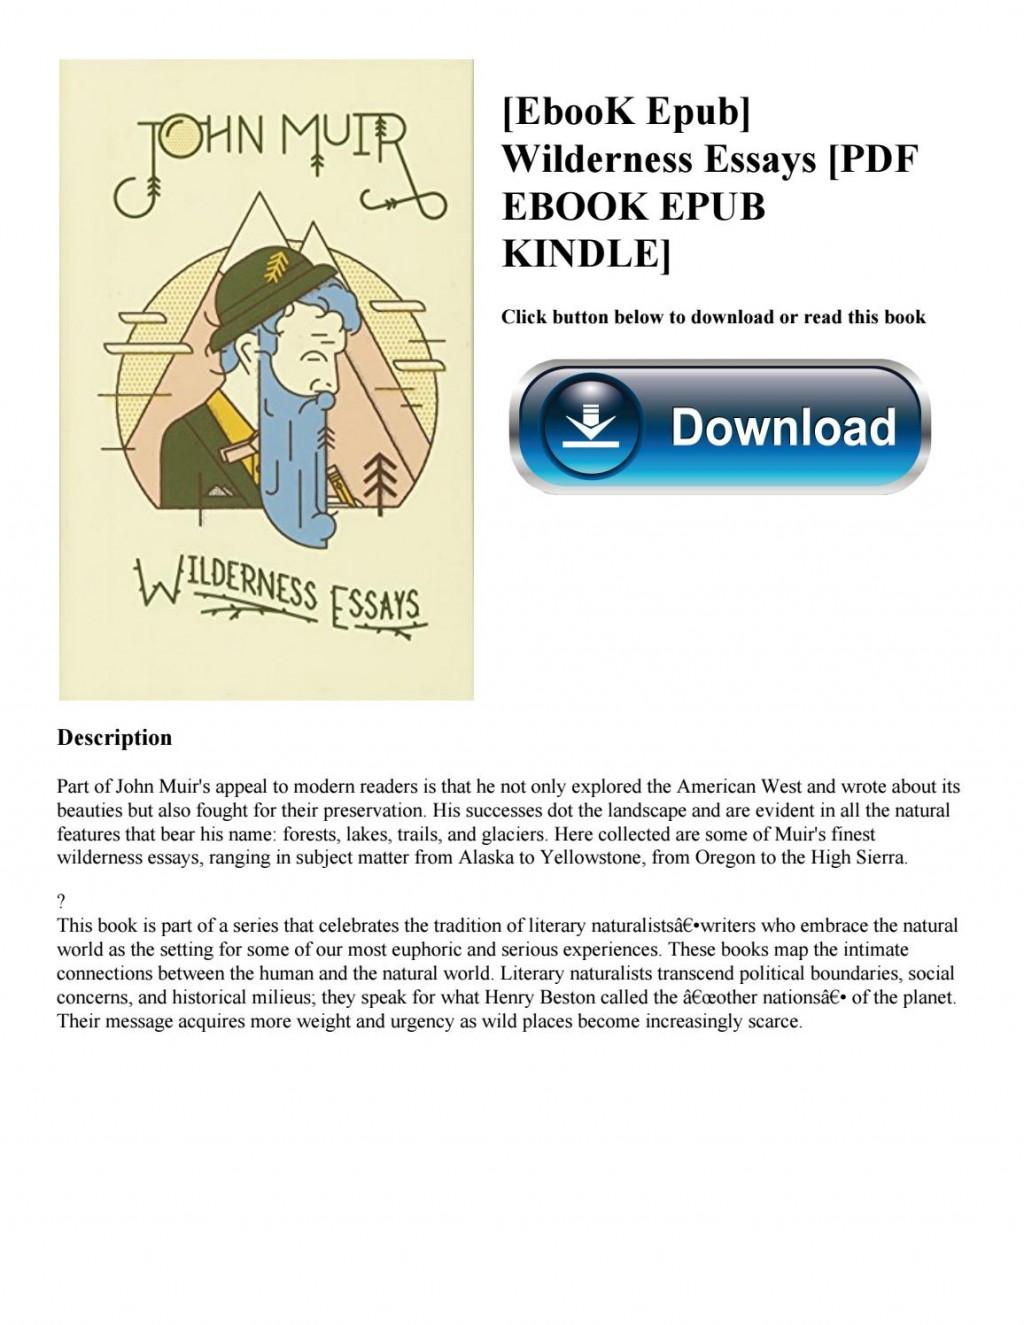 019 John Muir Wilderness Essays Page 1 Essay Best Pdf Review Large